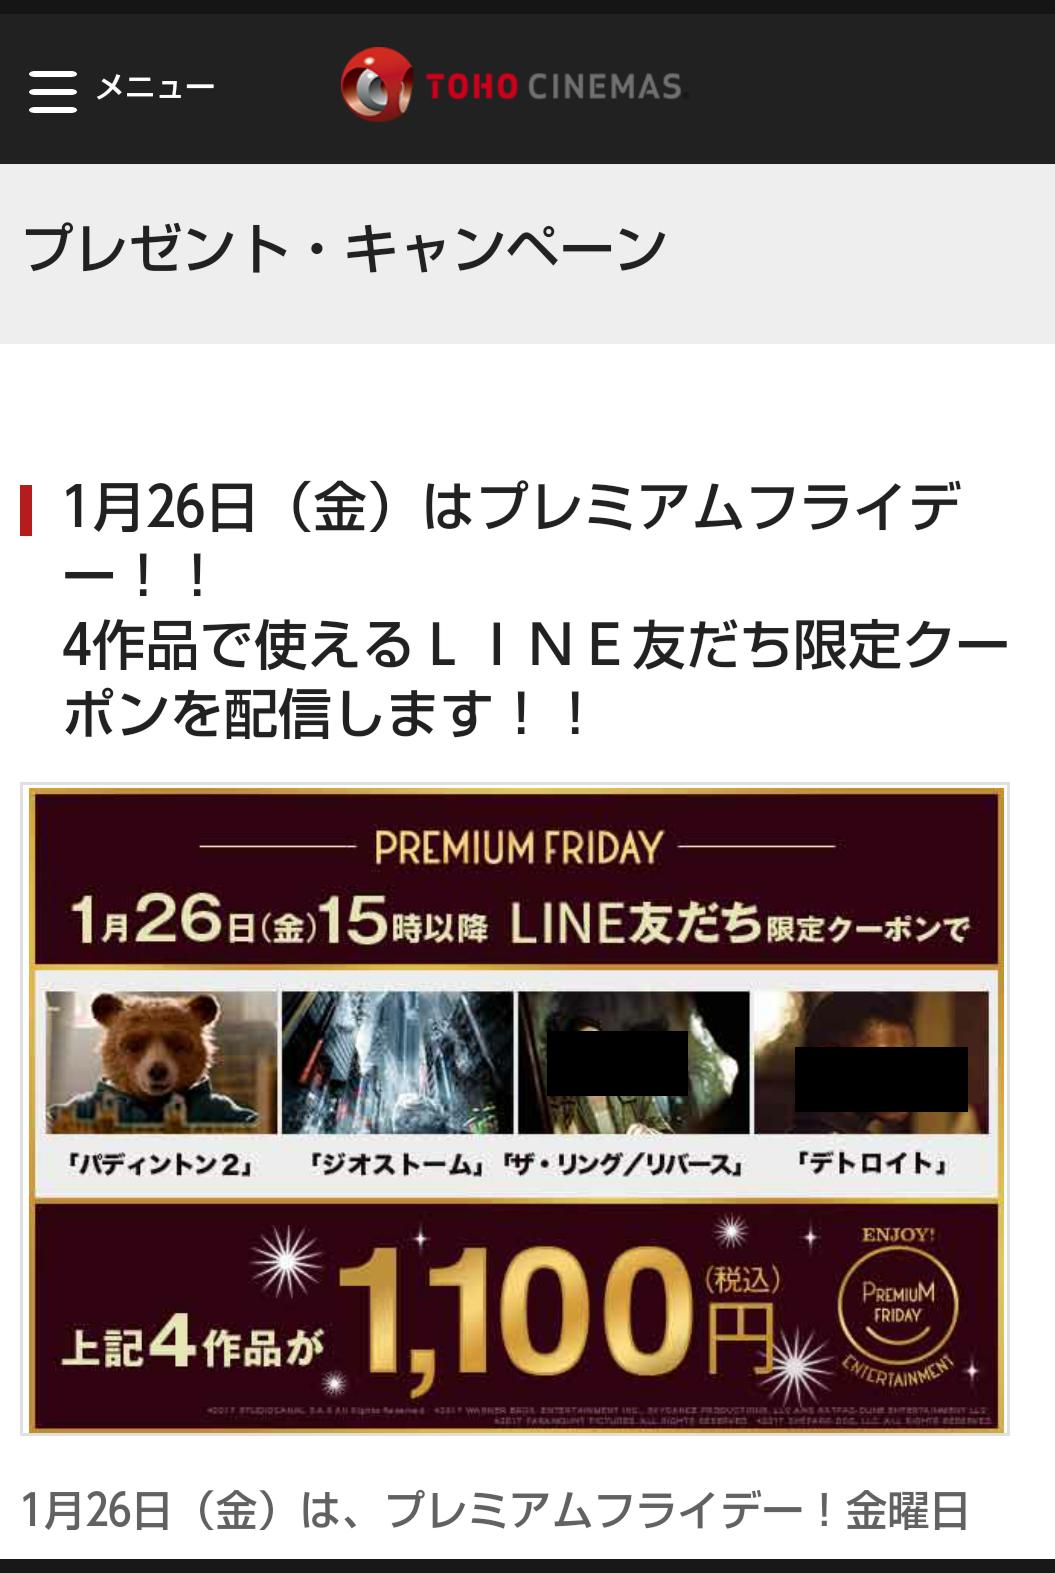 TOHOとLine友達で本日15時~4作品が1100円で見られるよ♪